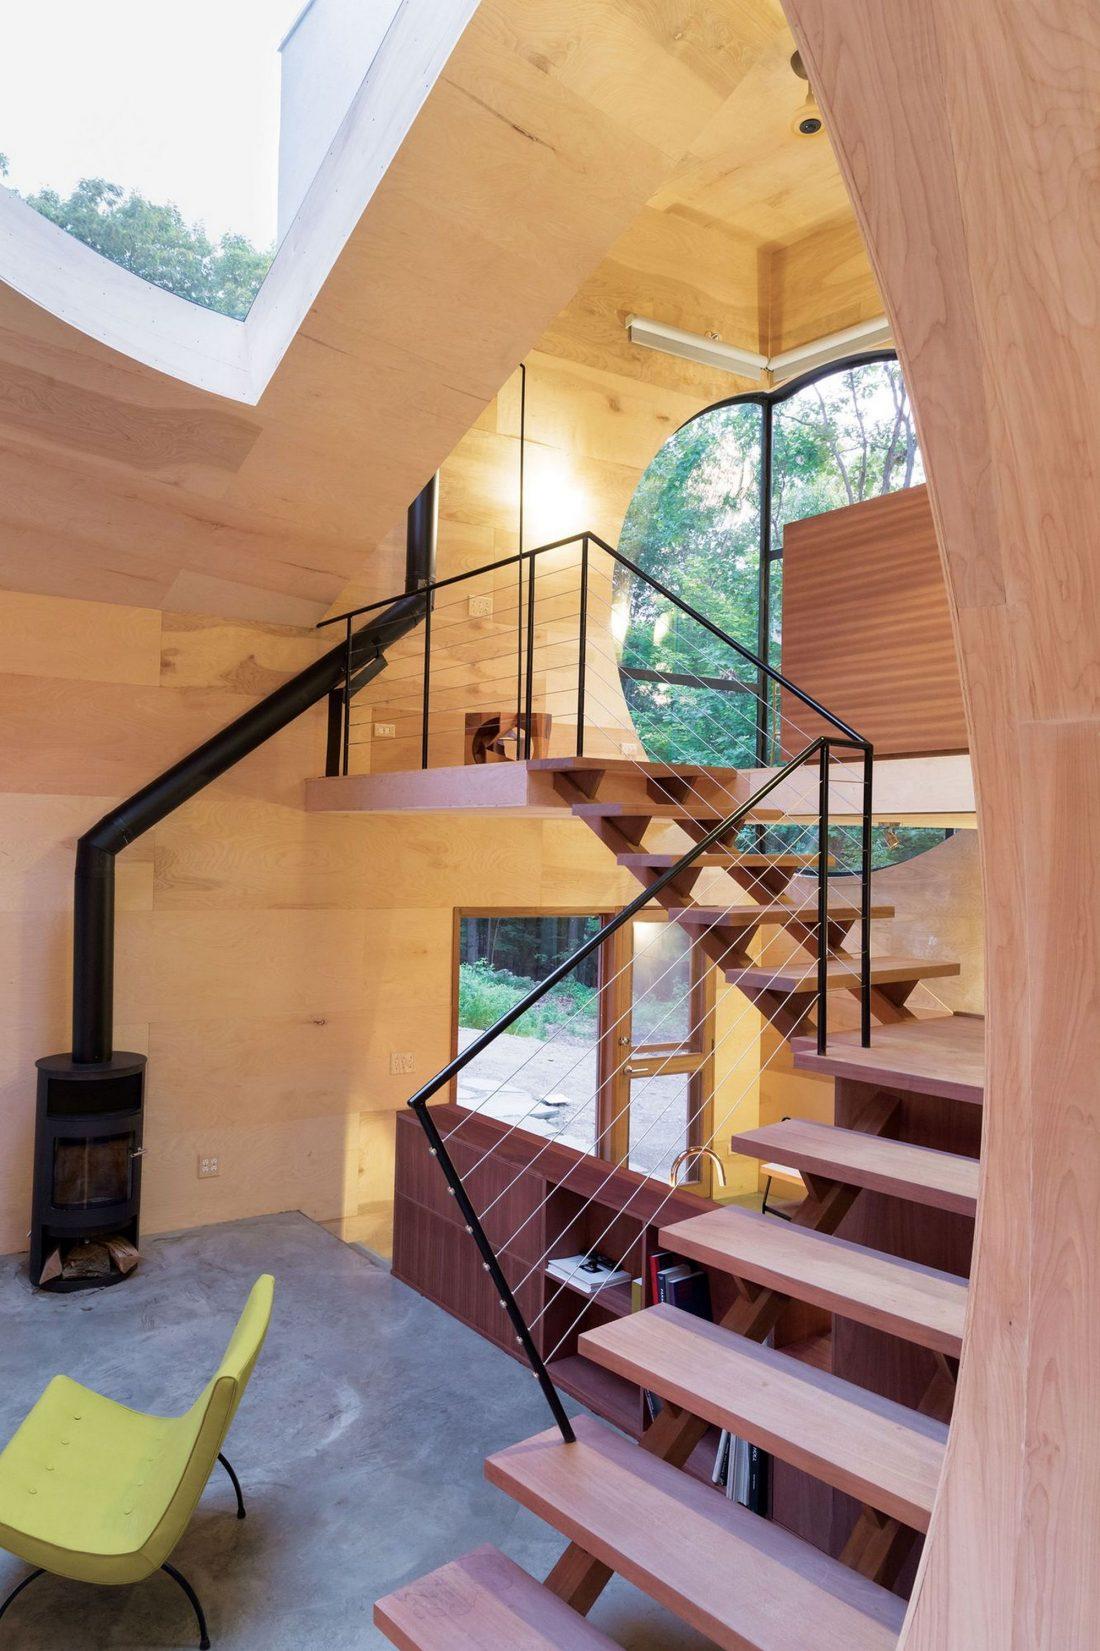 4d-gostevoj-dom-v-lesu-po-proektu-steven-holl-architects-5